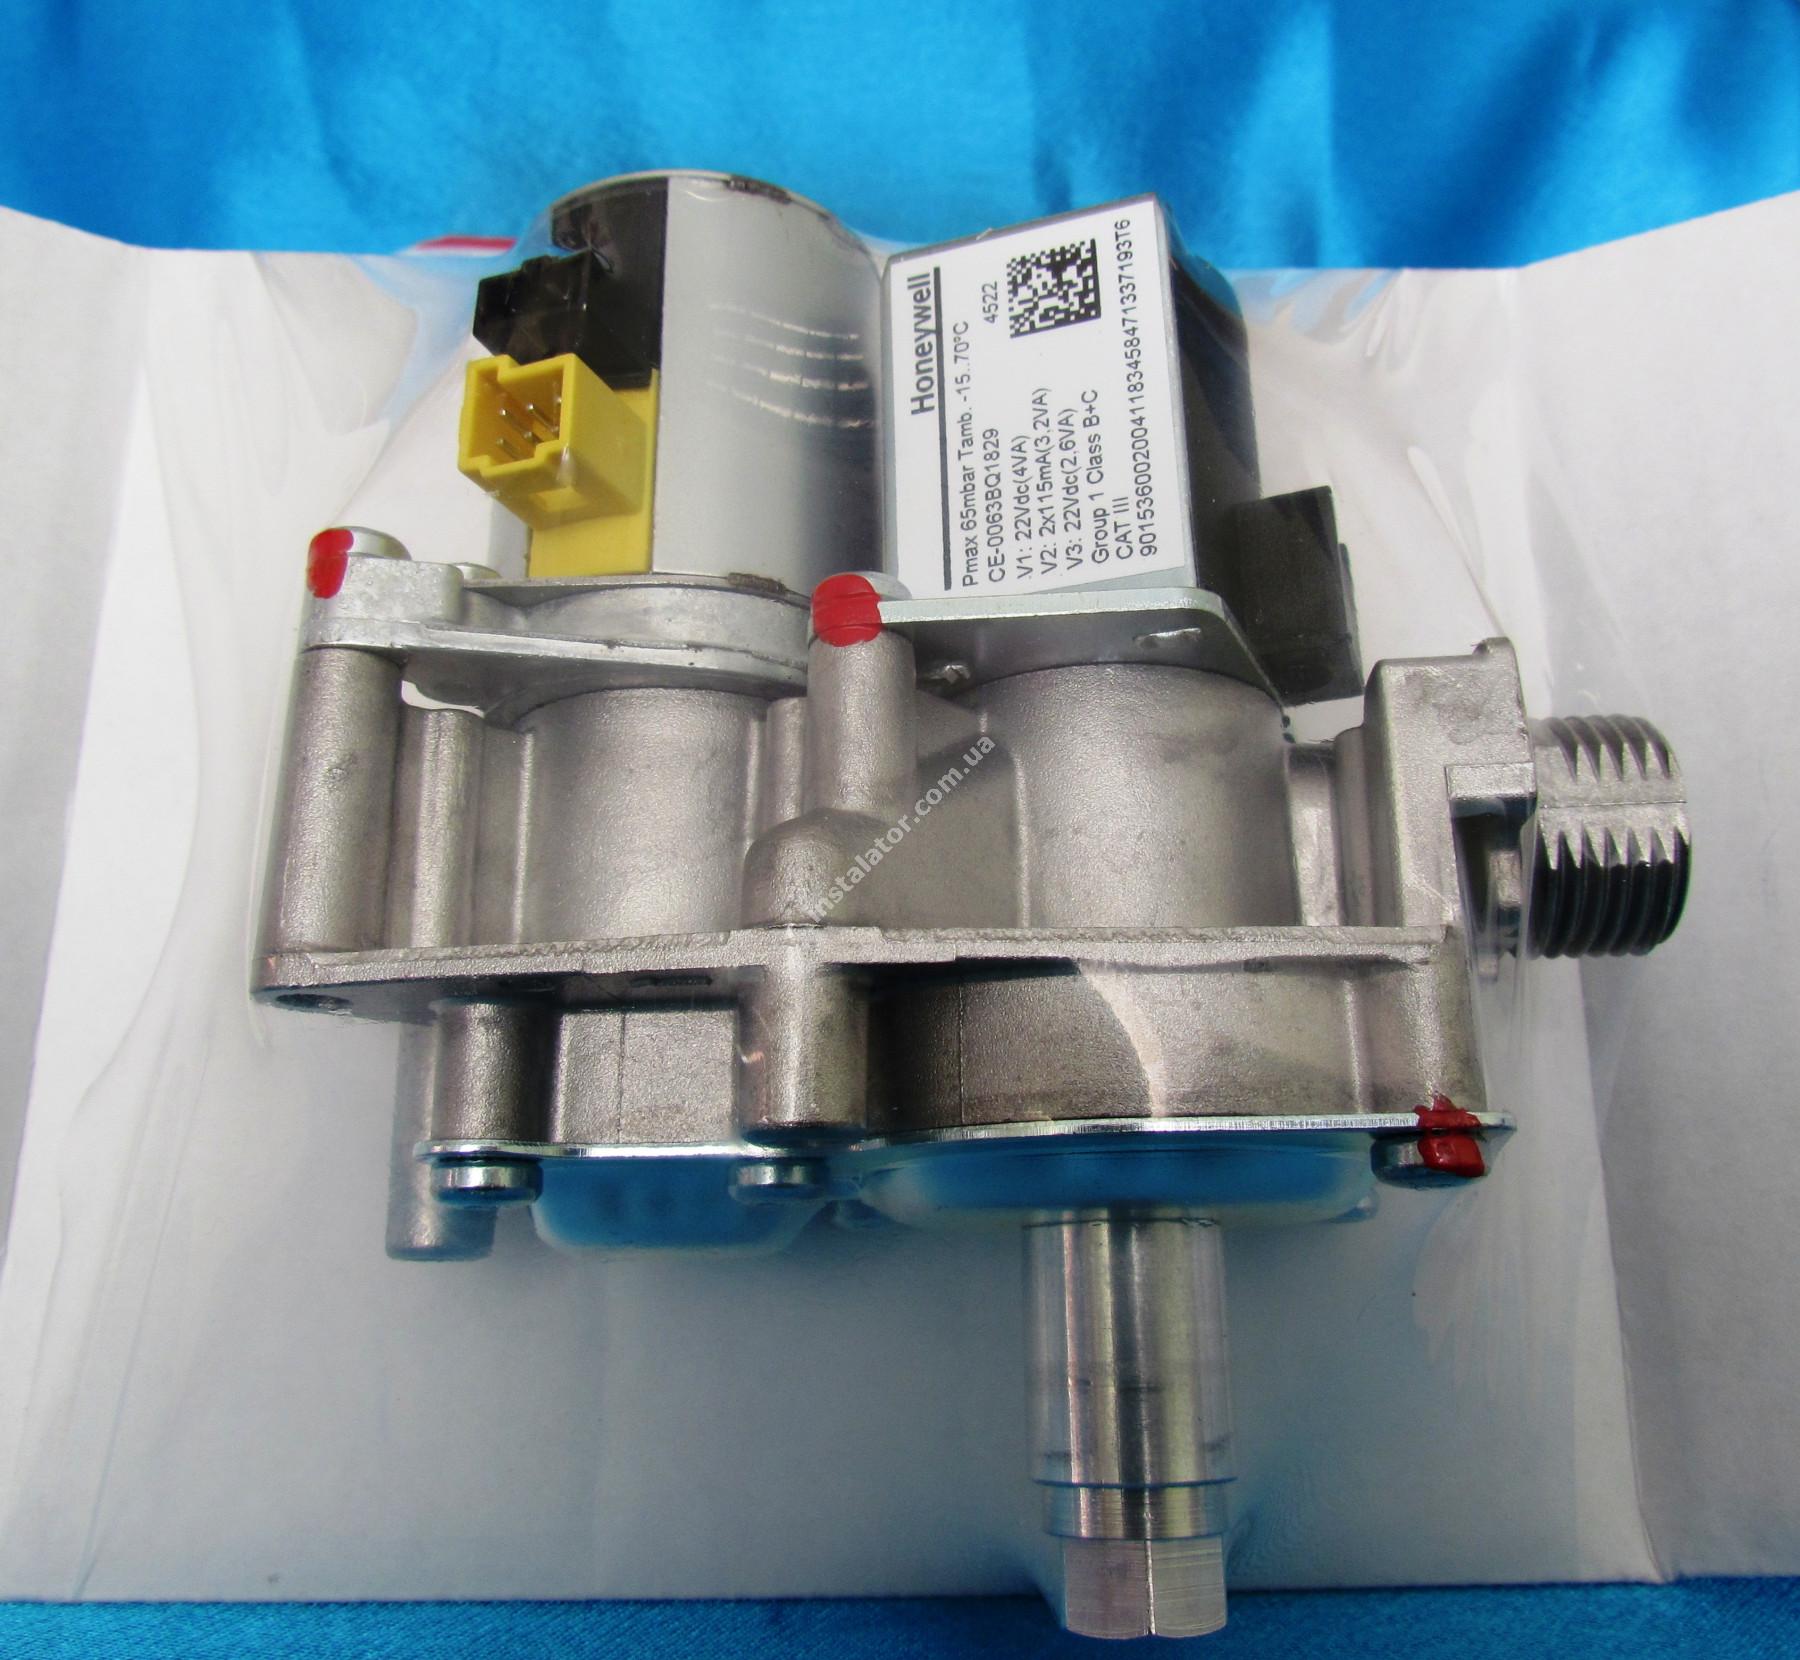 0020053968/0020049296 Газовий клапан з регулятором PROTHERM/VAILLANT full-image-0